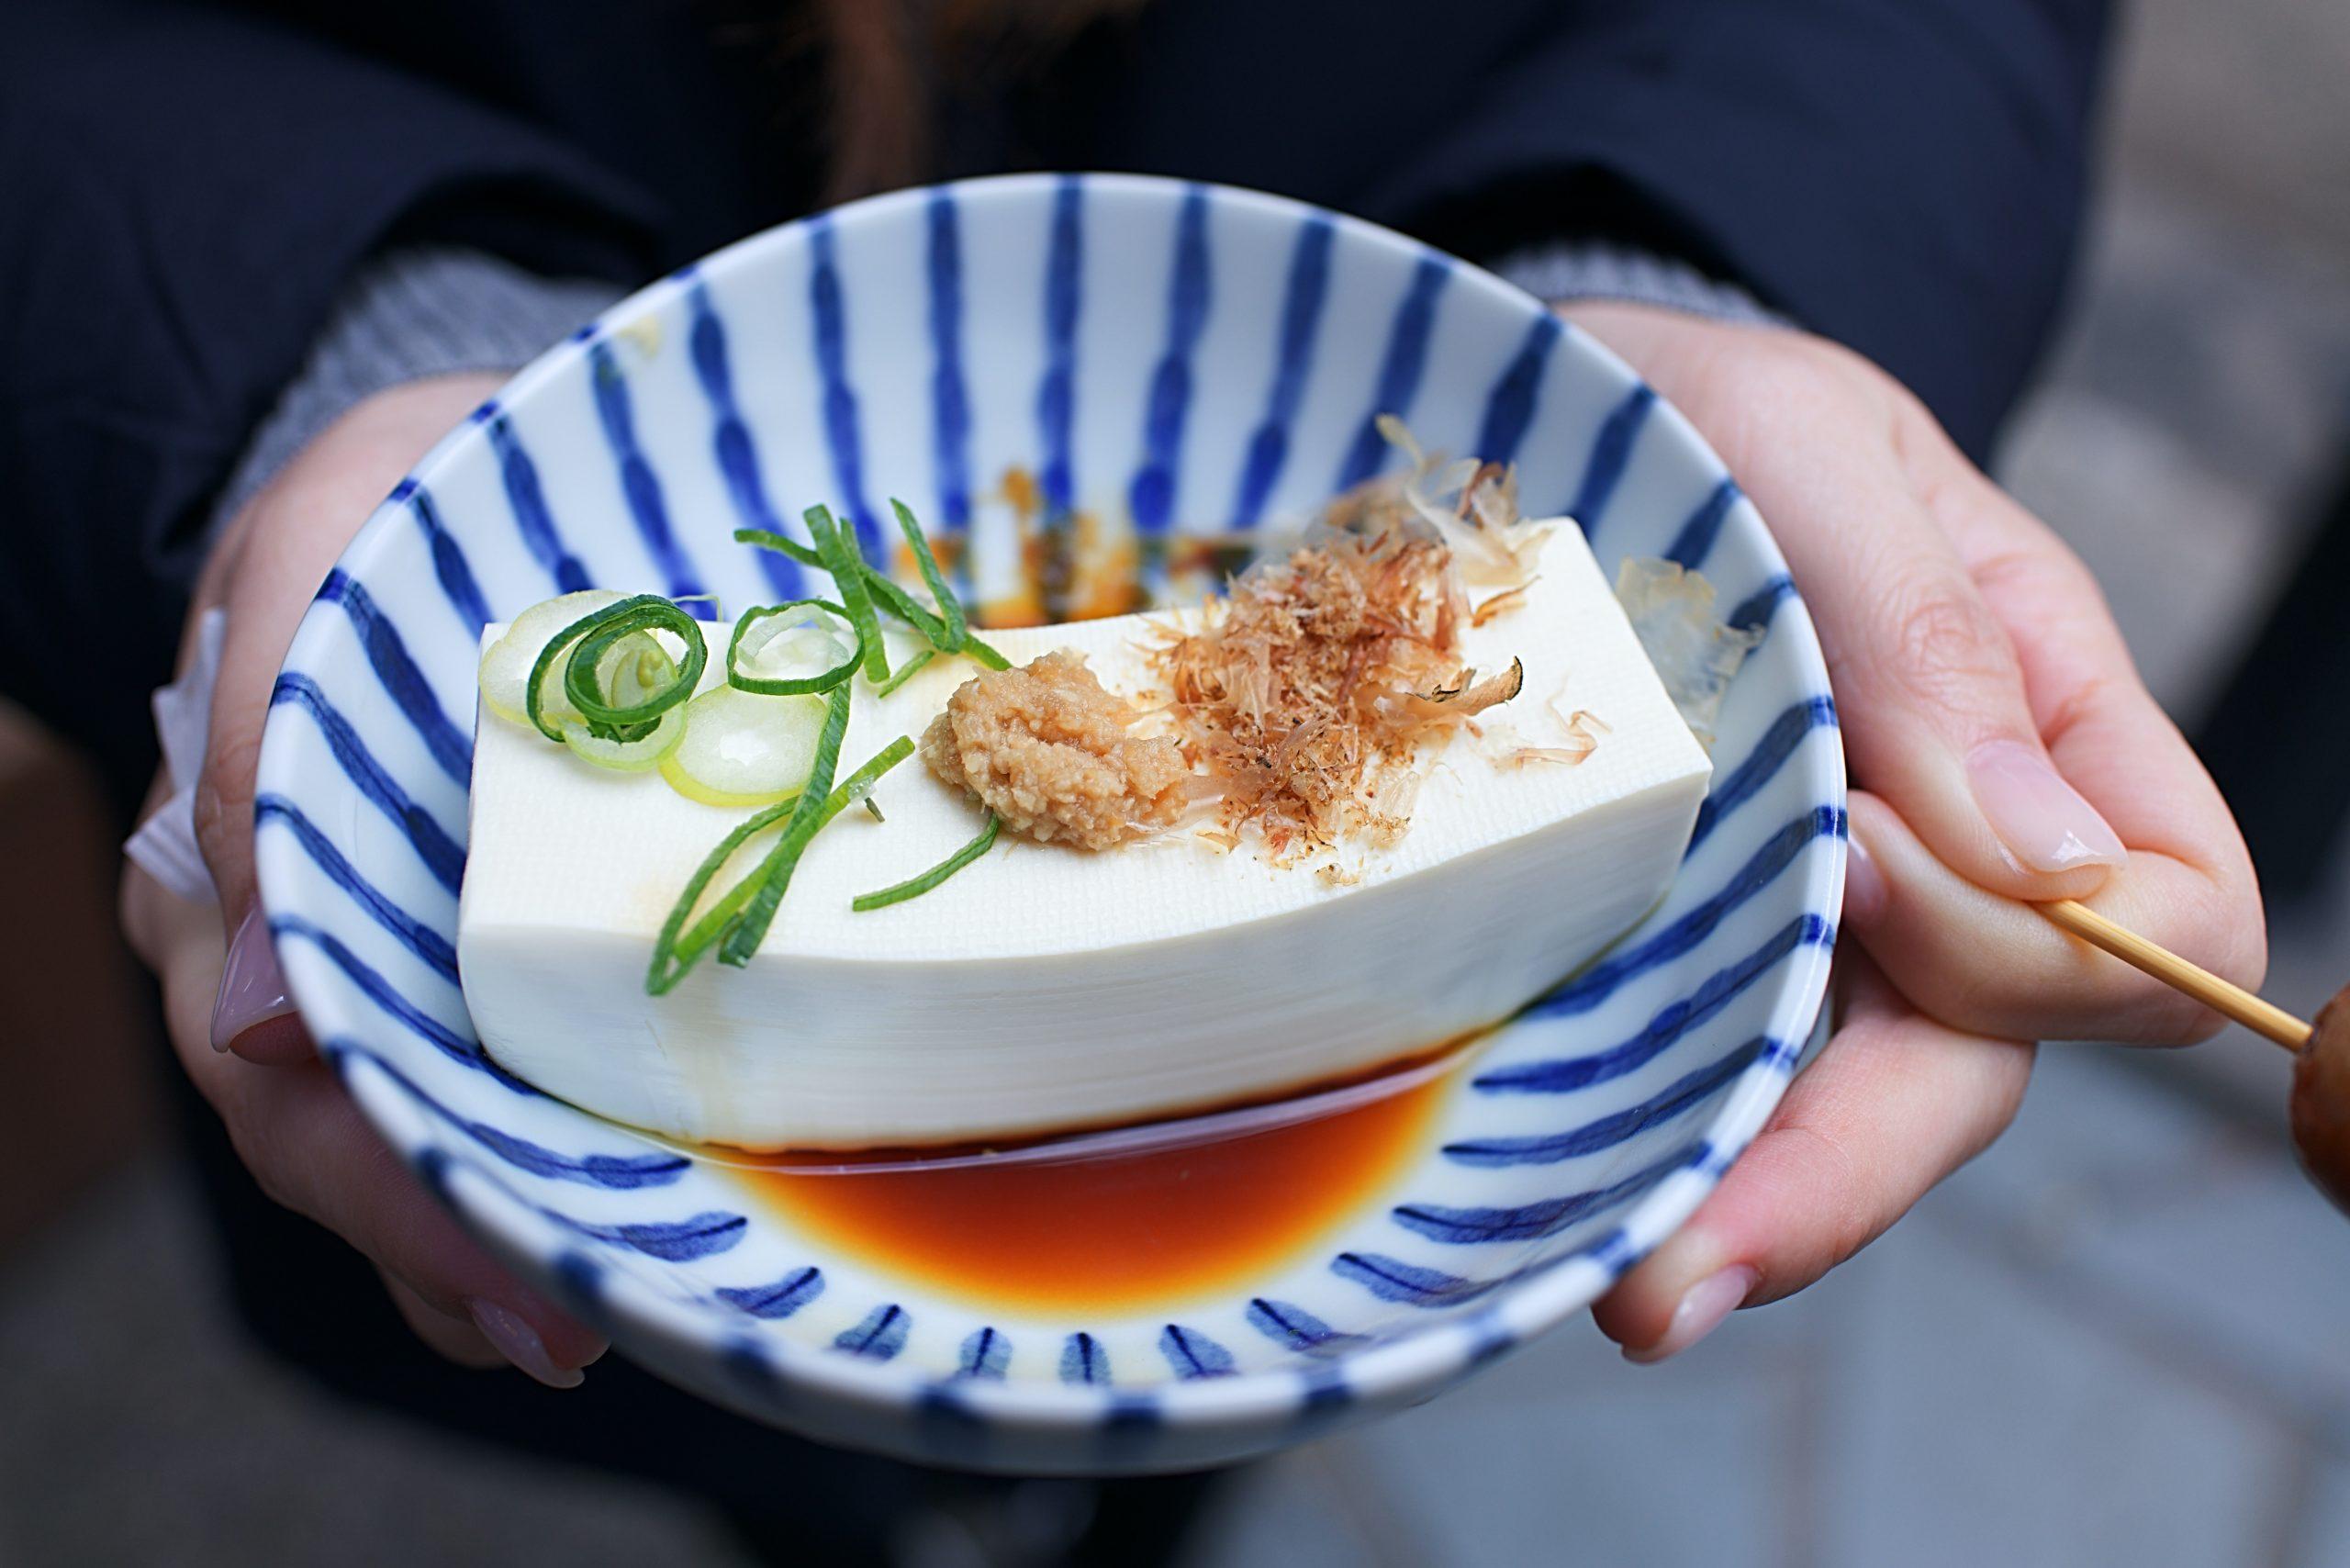 10 september: Smaka på en kultur - Japan